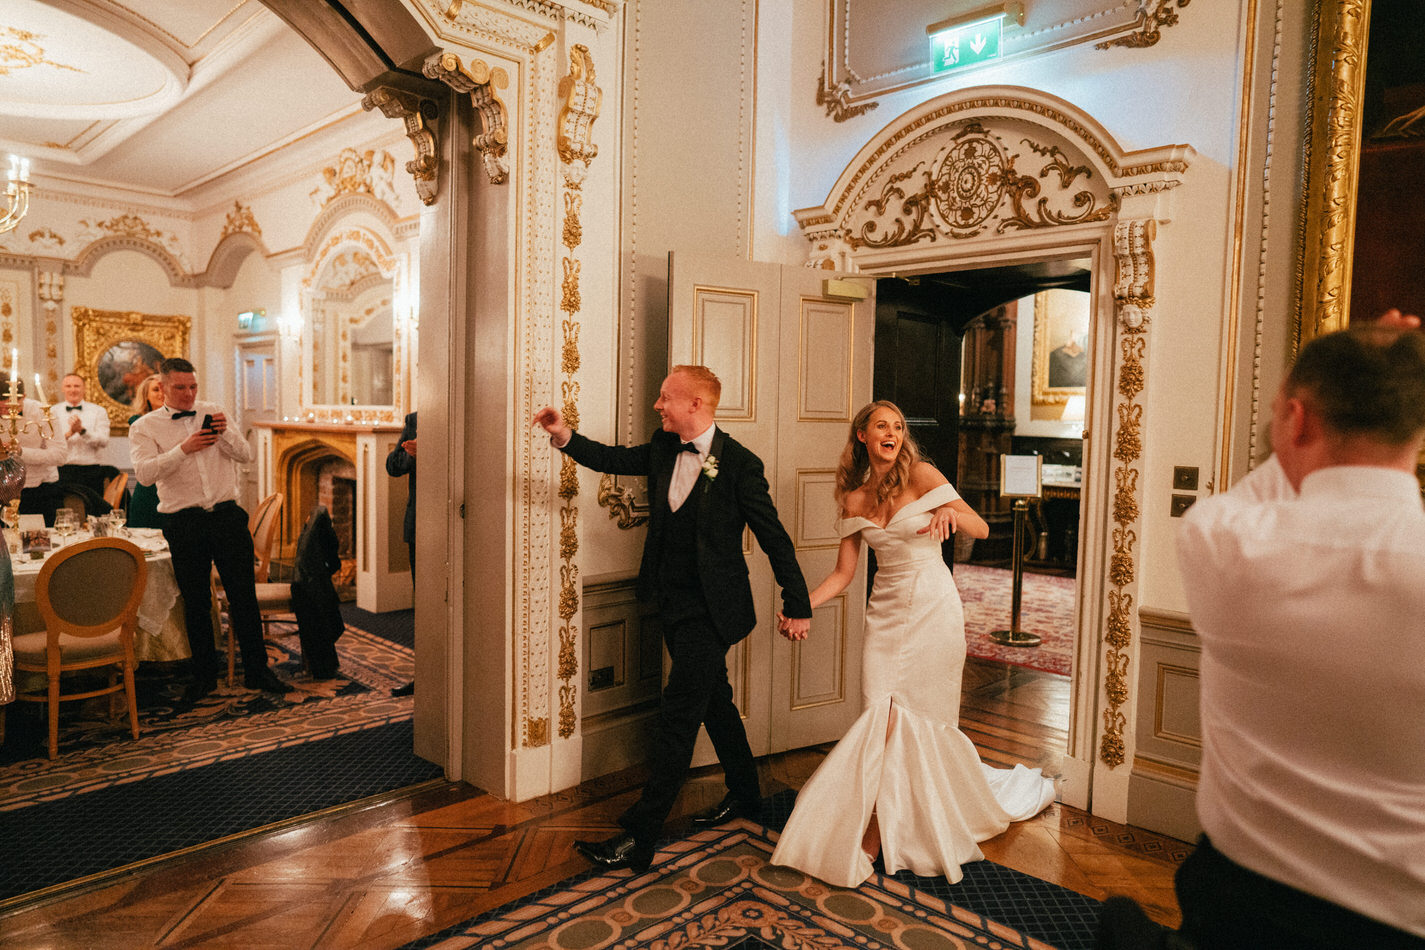 Castle-wedding-ireland-photos- 0282 215